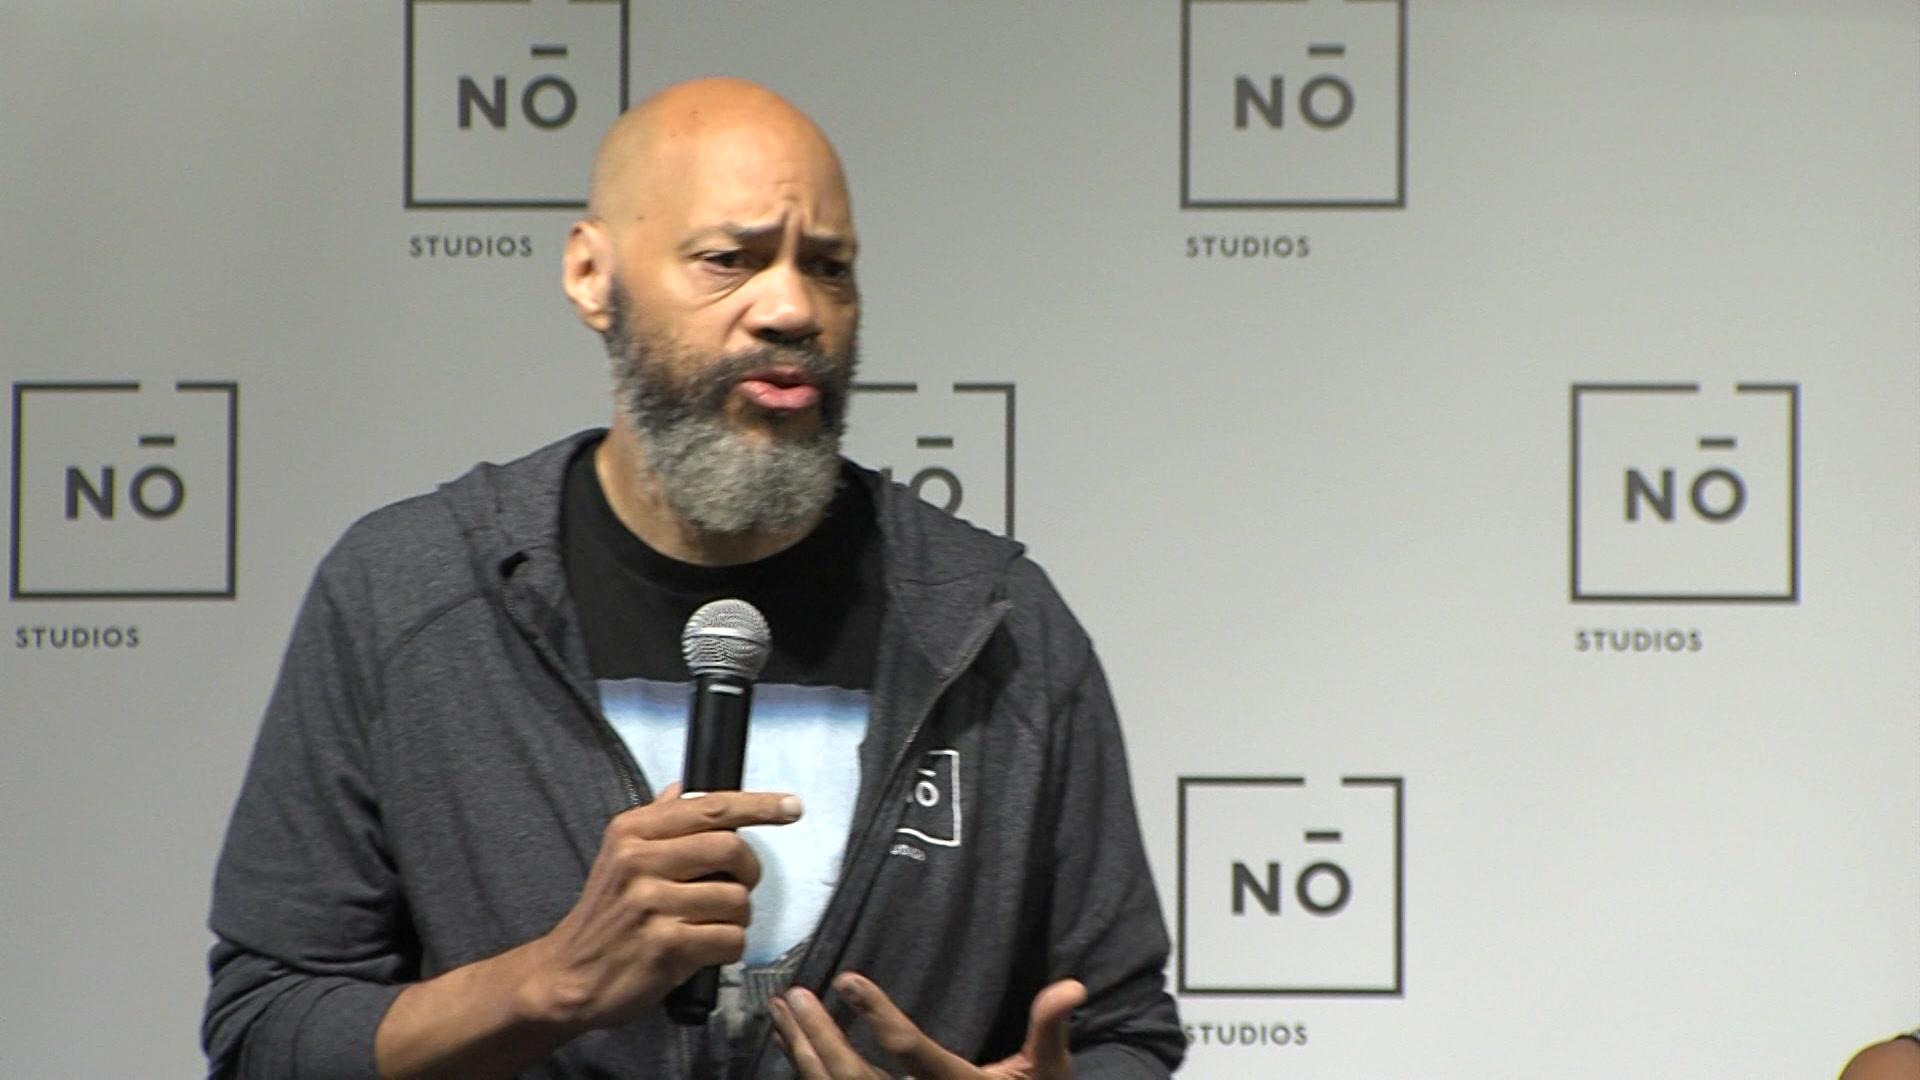 Oscar-winning filmmaker, Milwaukee native discusses Social Justice Summit at No Studios